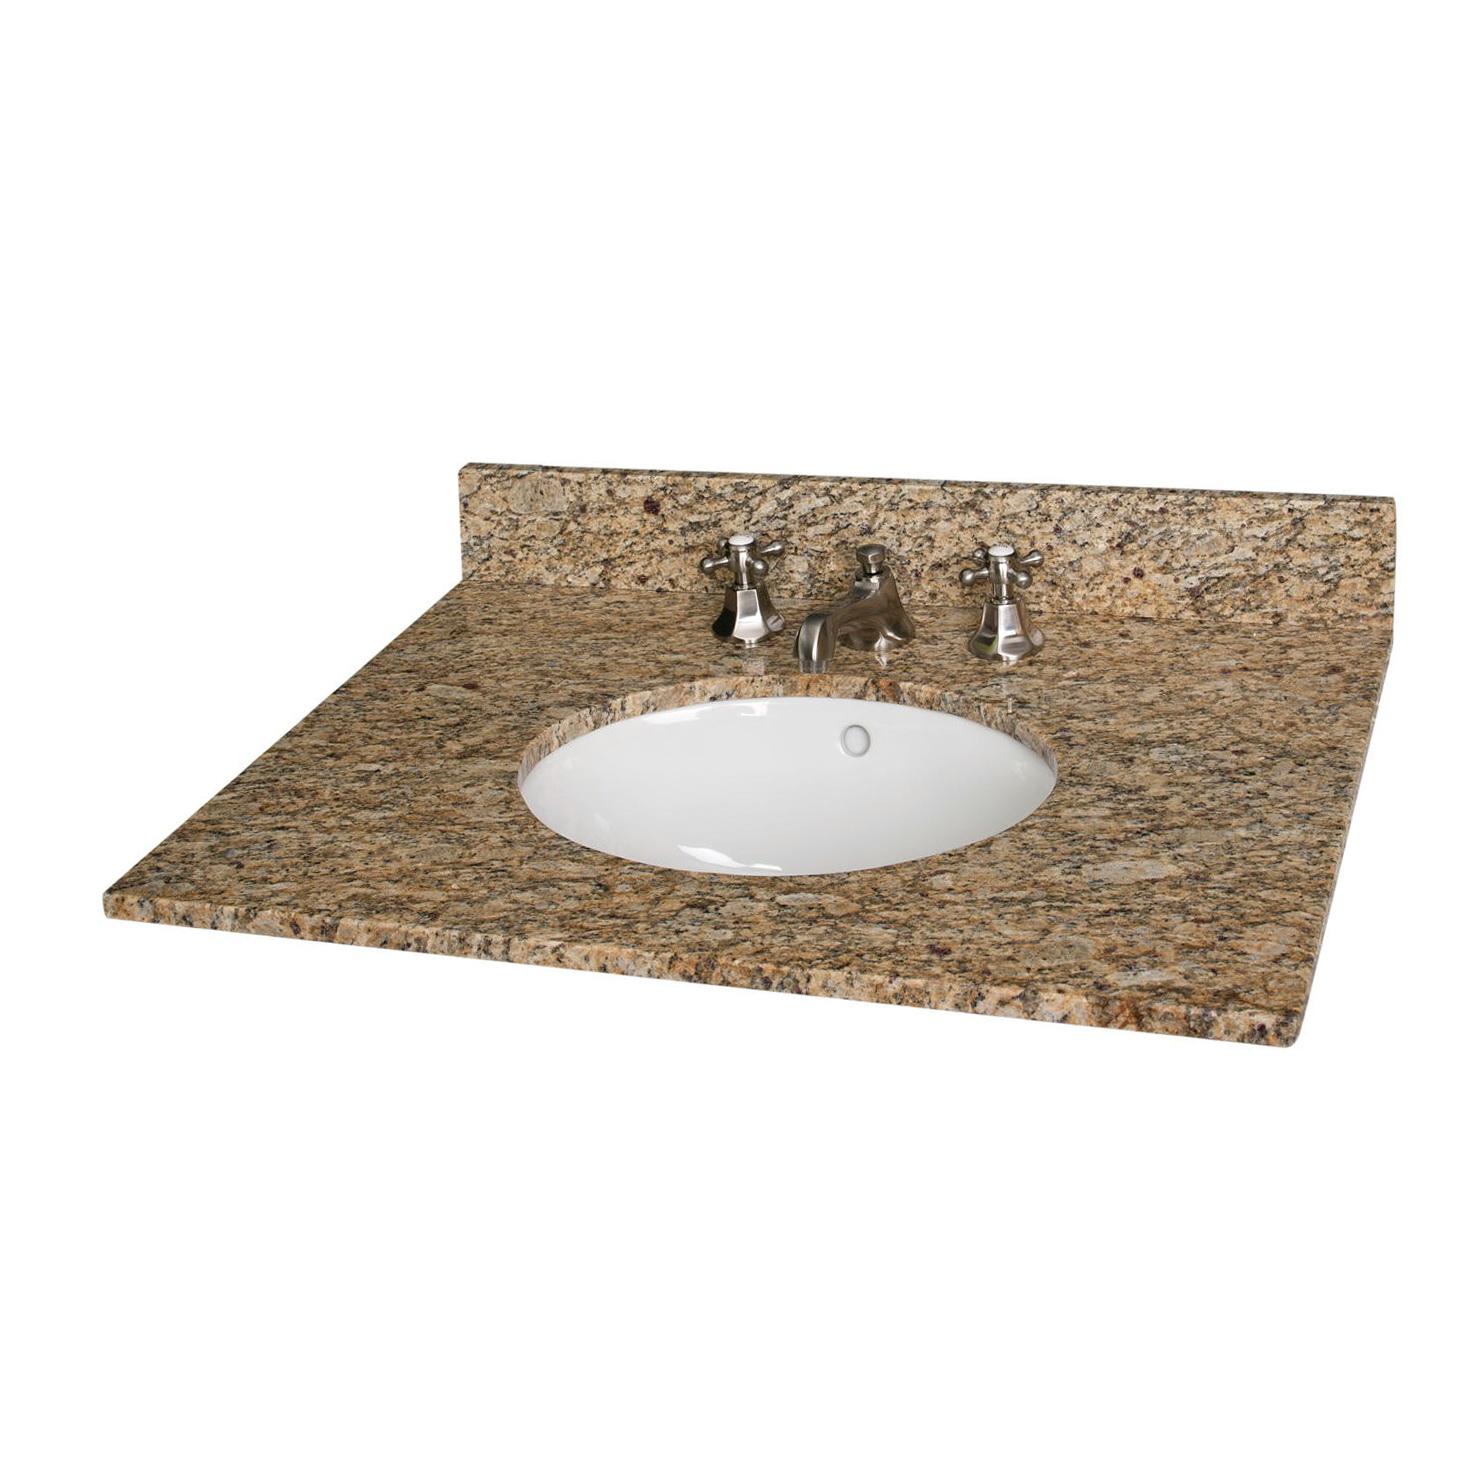 Marble Vanity Top With Undermount Sink